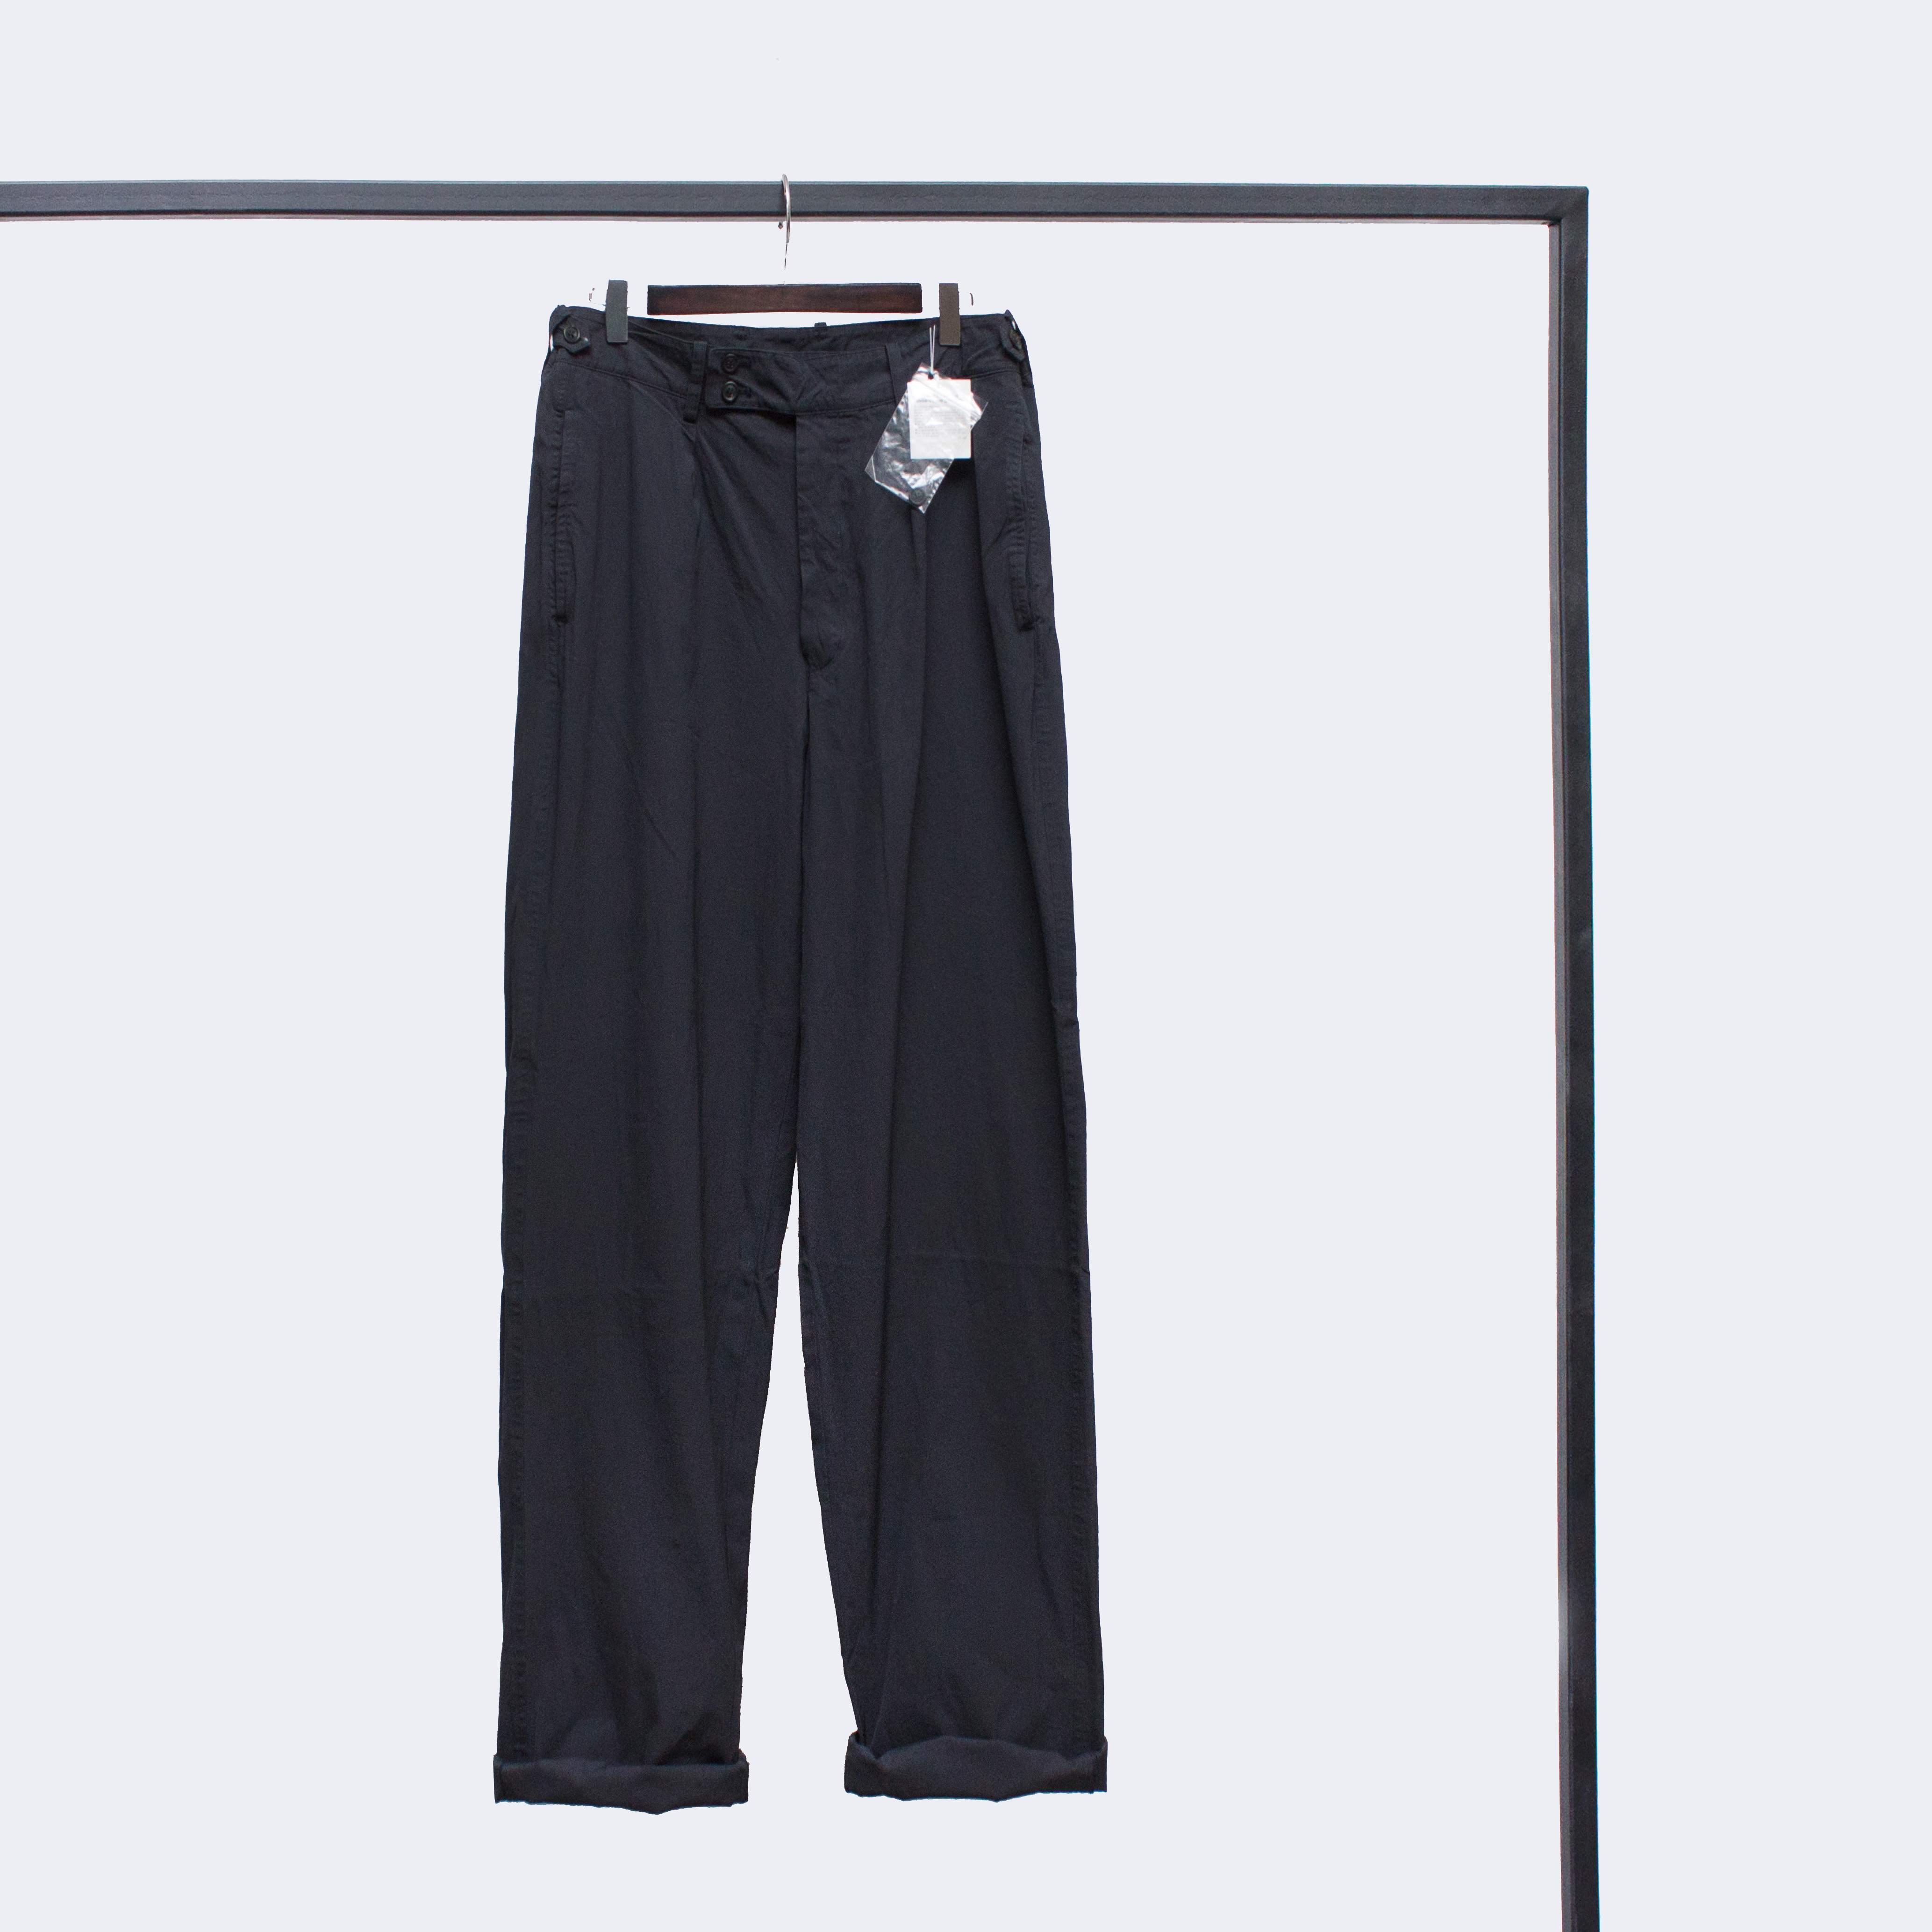 BNWT Issey Miyake Men wide leg trousers